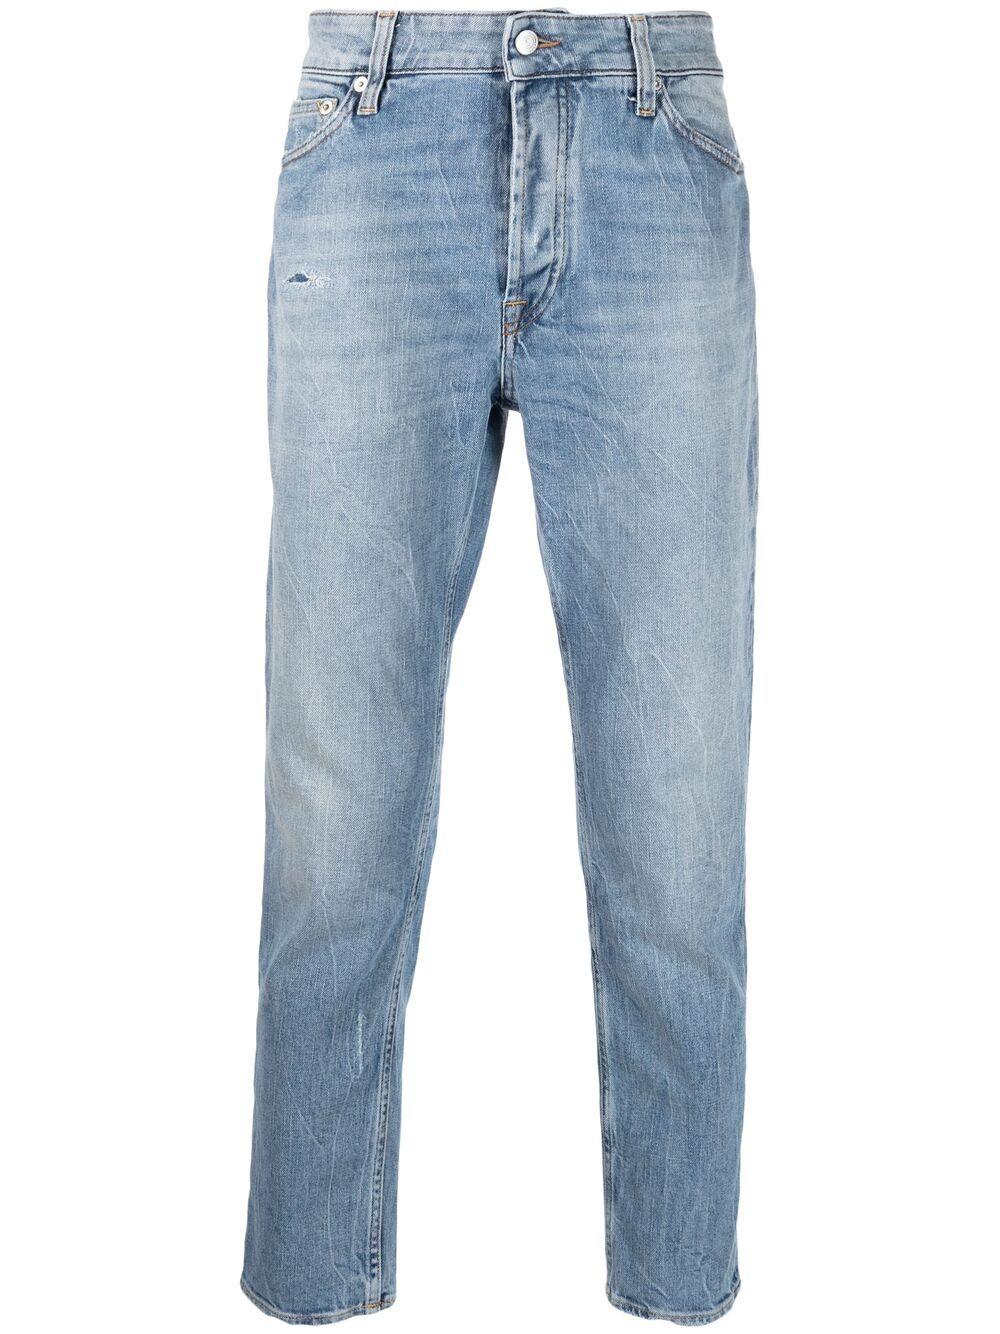 DEPARTMENT 5- Department5 Trousers Blue- Man- 30 - Blue